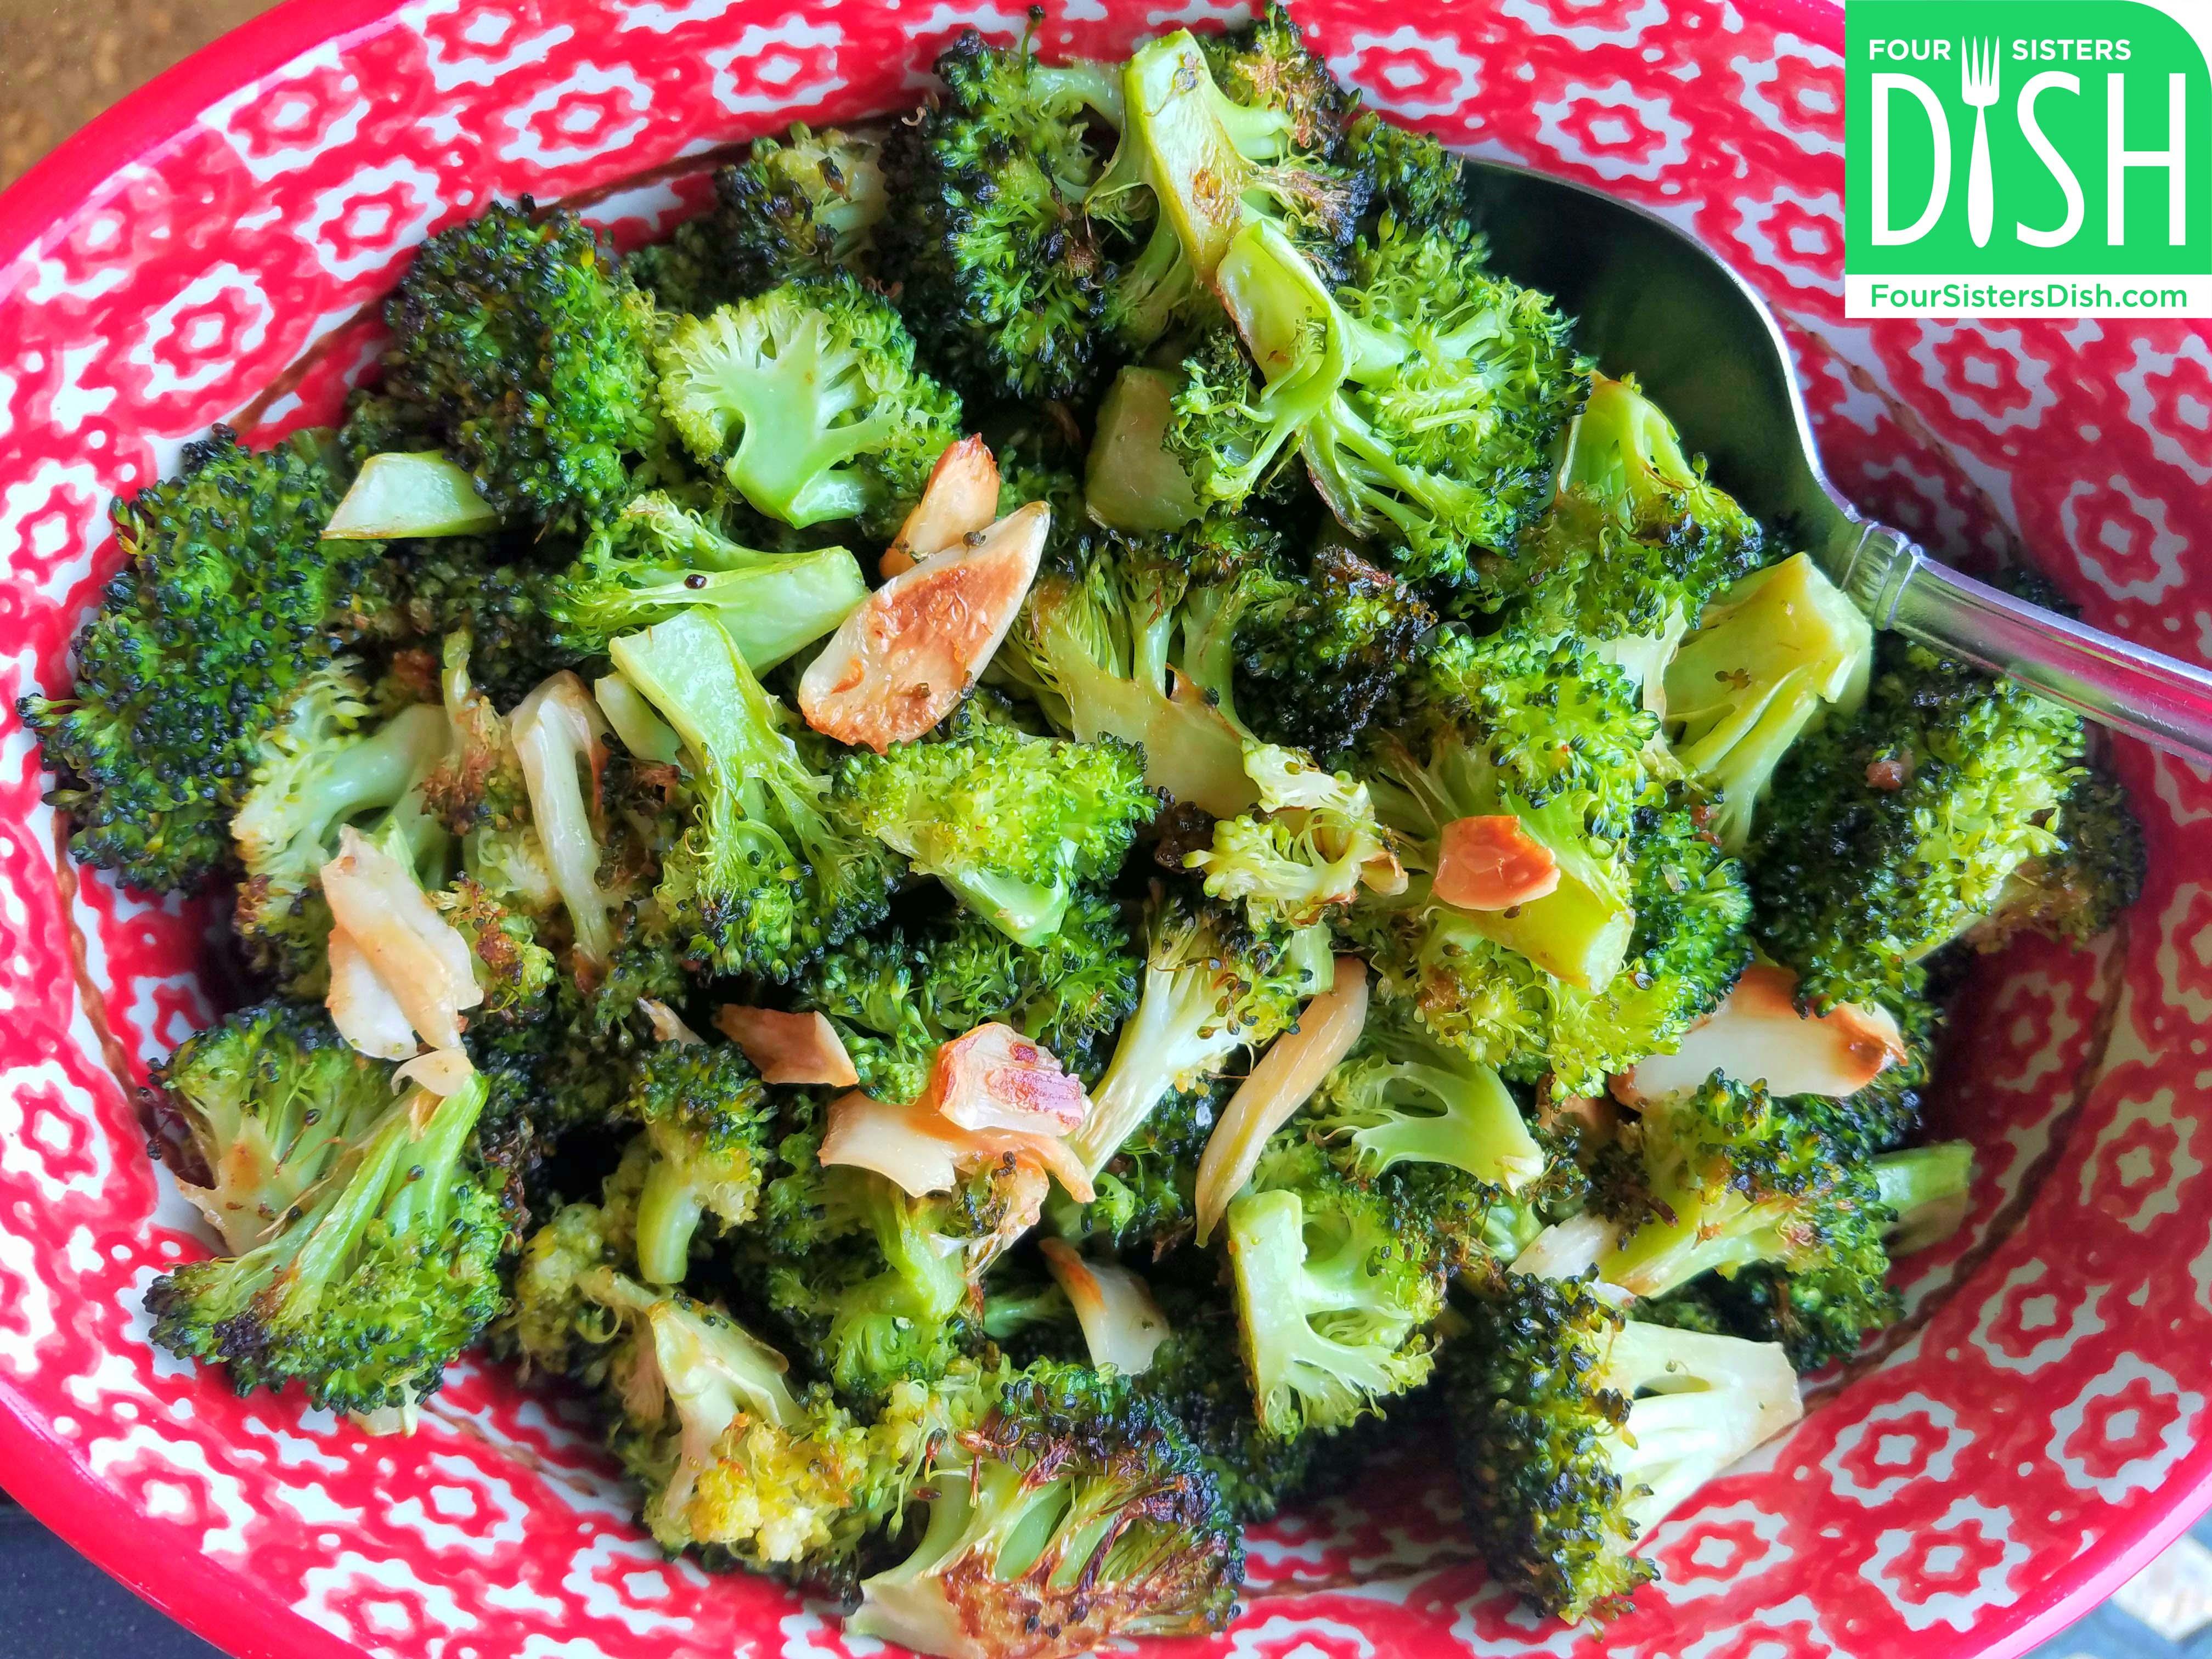 Roasted Broccoli & Garlic